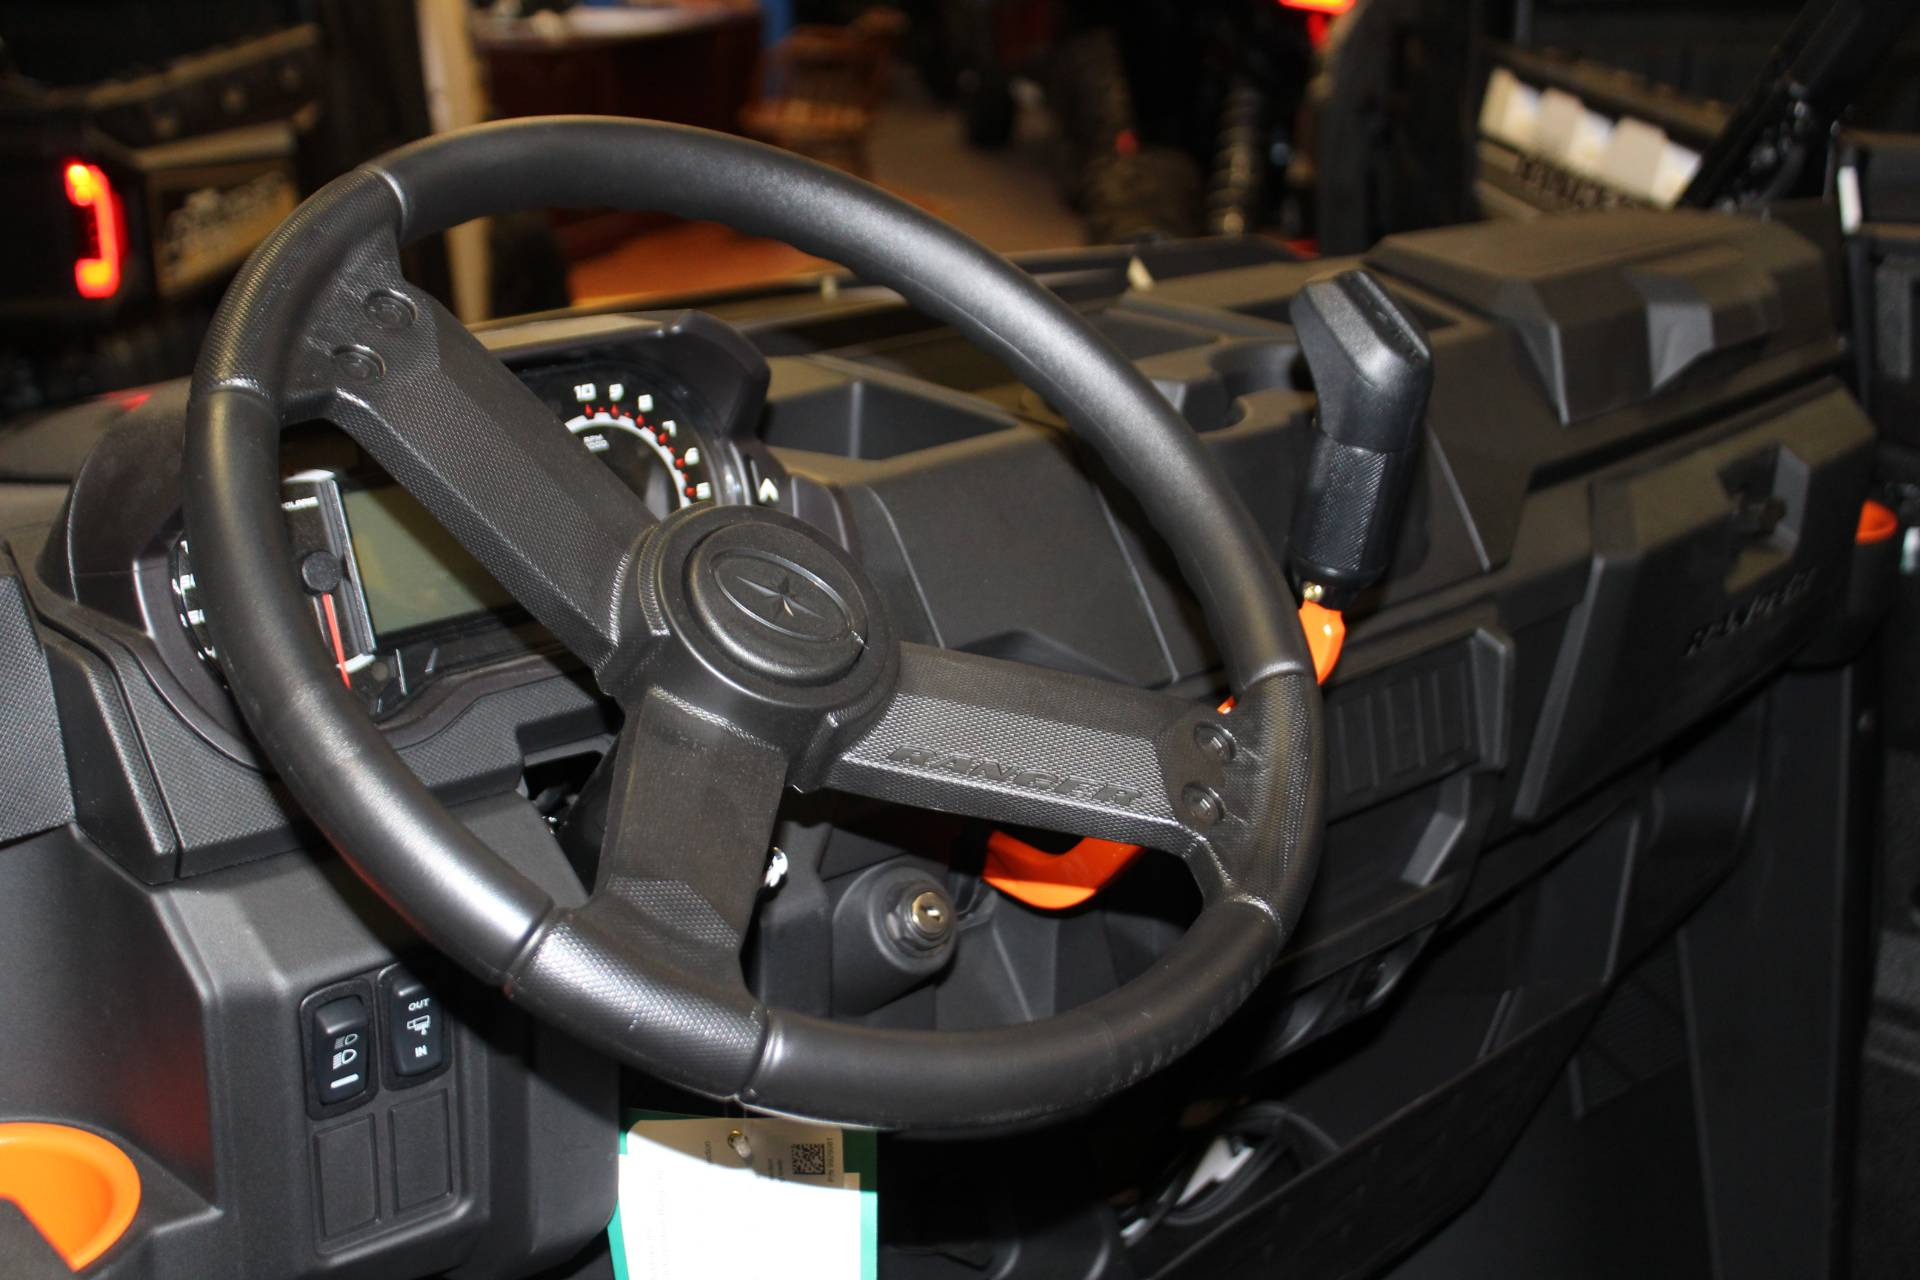 2019 Polaris Ranger Xp 1000 Eps High Lifter Edition Utility Vehicles Accessory Fuse Box In Palatka Florida